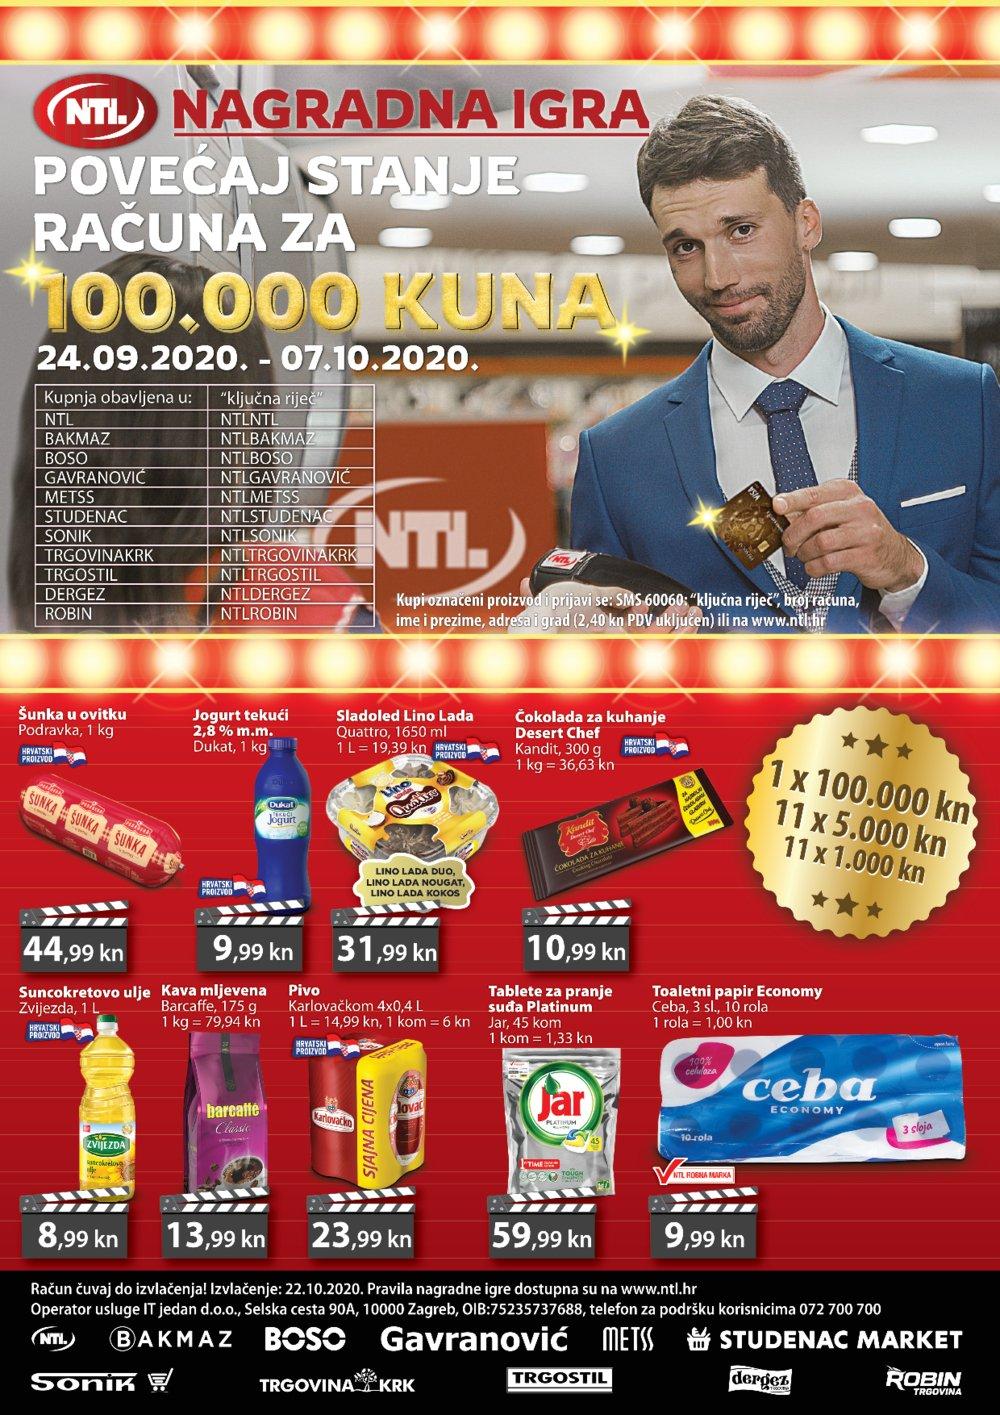 Sonik katalog NTL Maxi Tjedna ponuda 24.09.-30.09.2020.